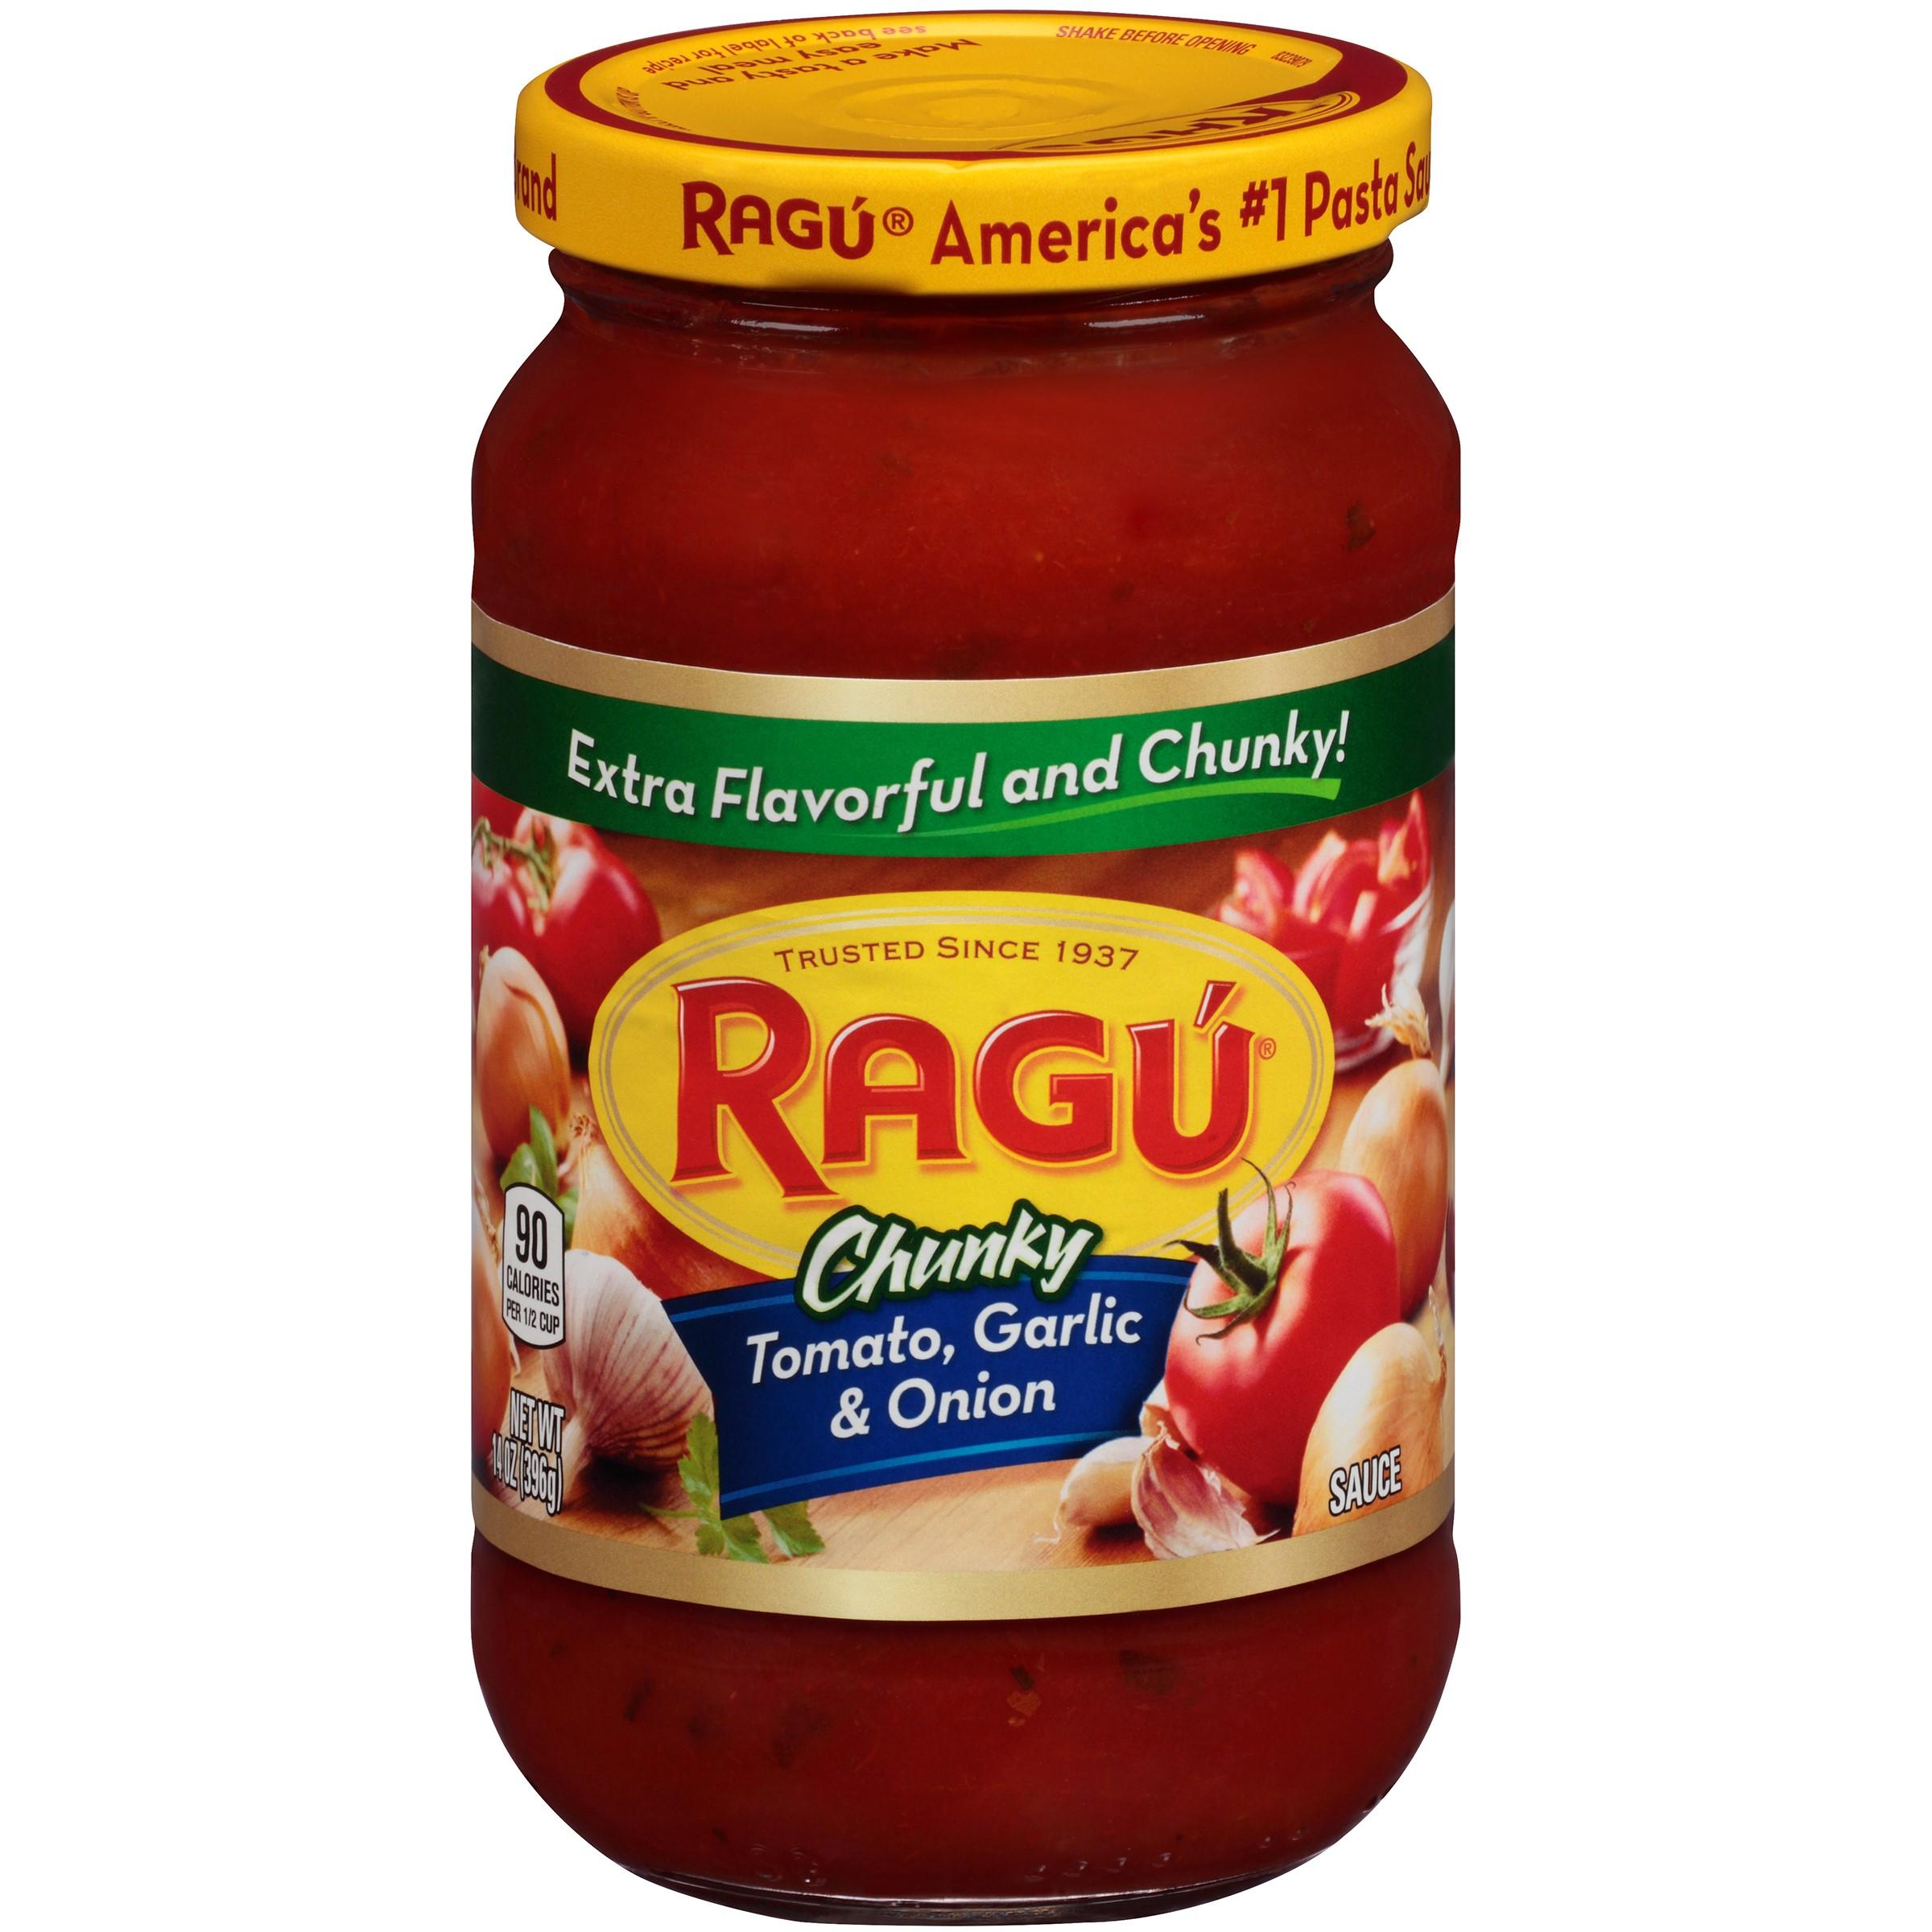 Ragú® Chunky Tomato, Garlic & Onion Pasta Sauce 14 oz. Jar